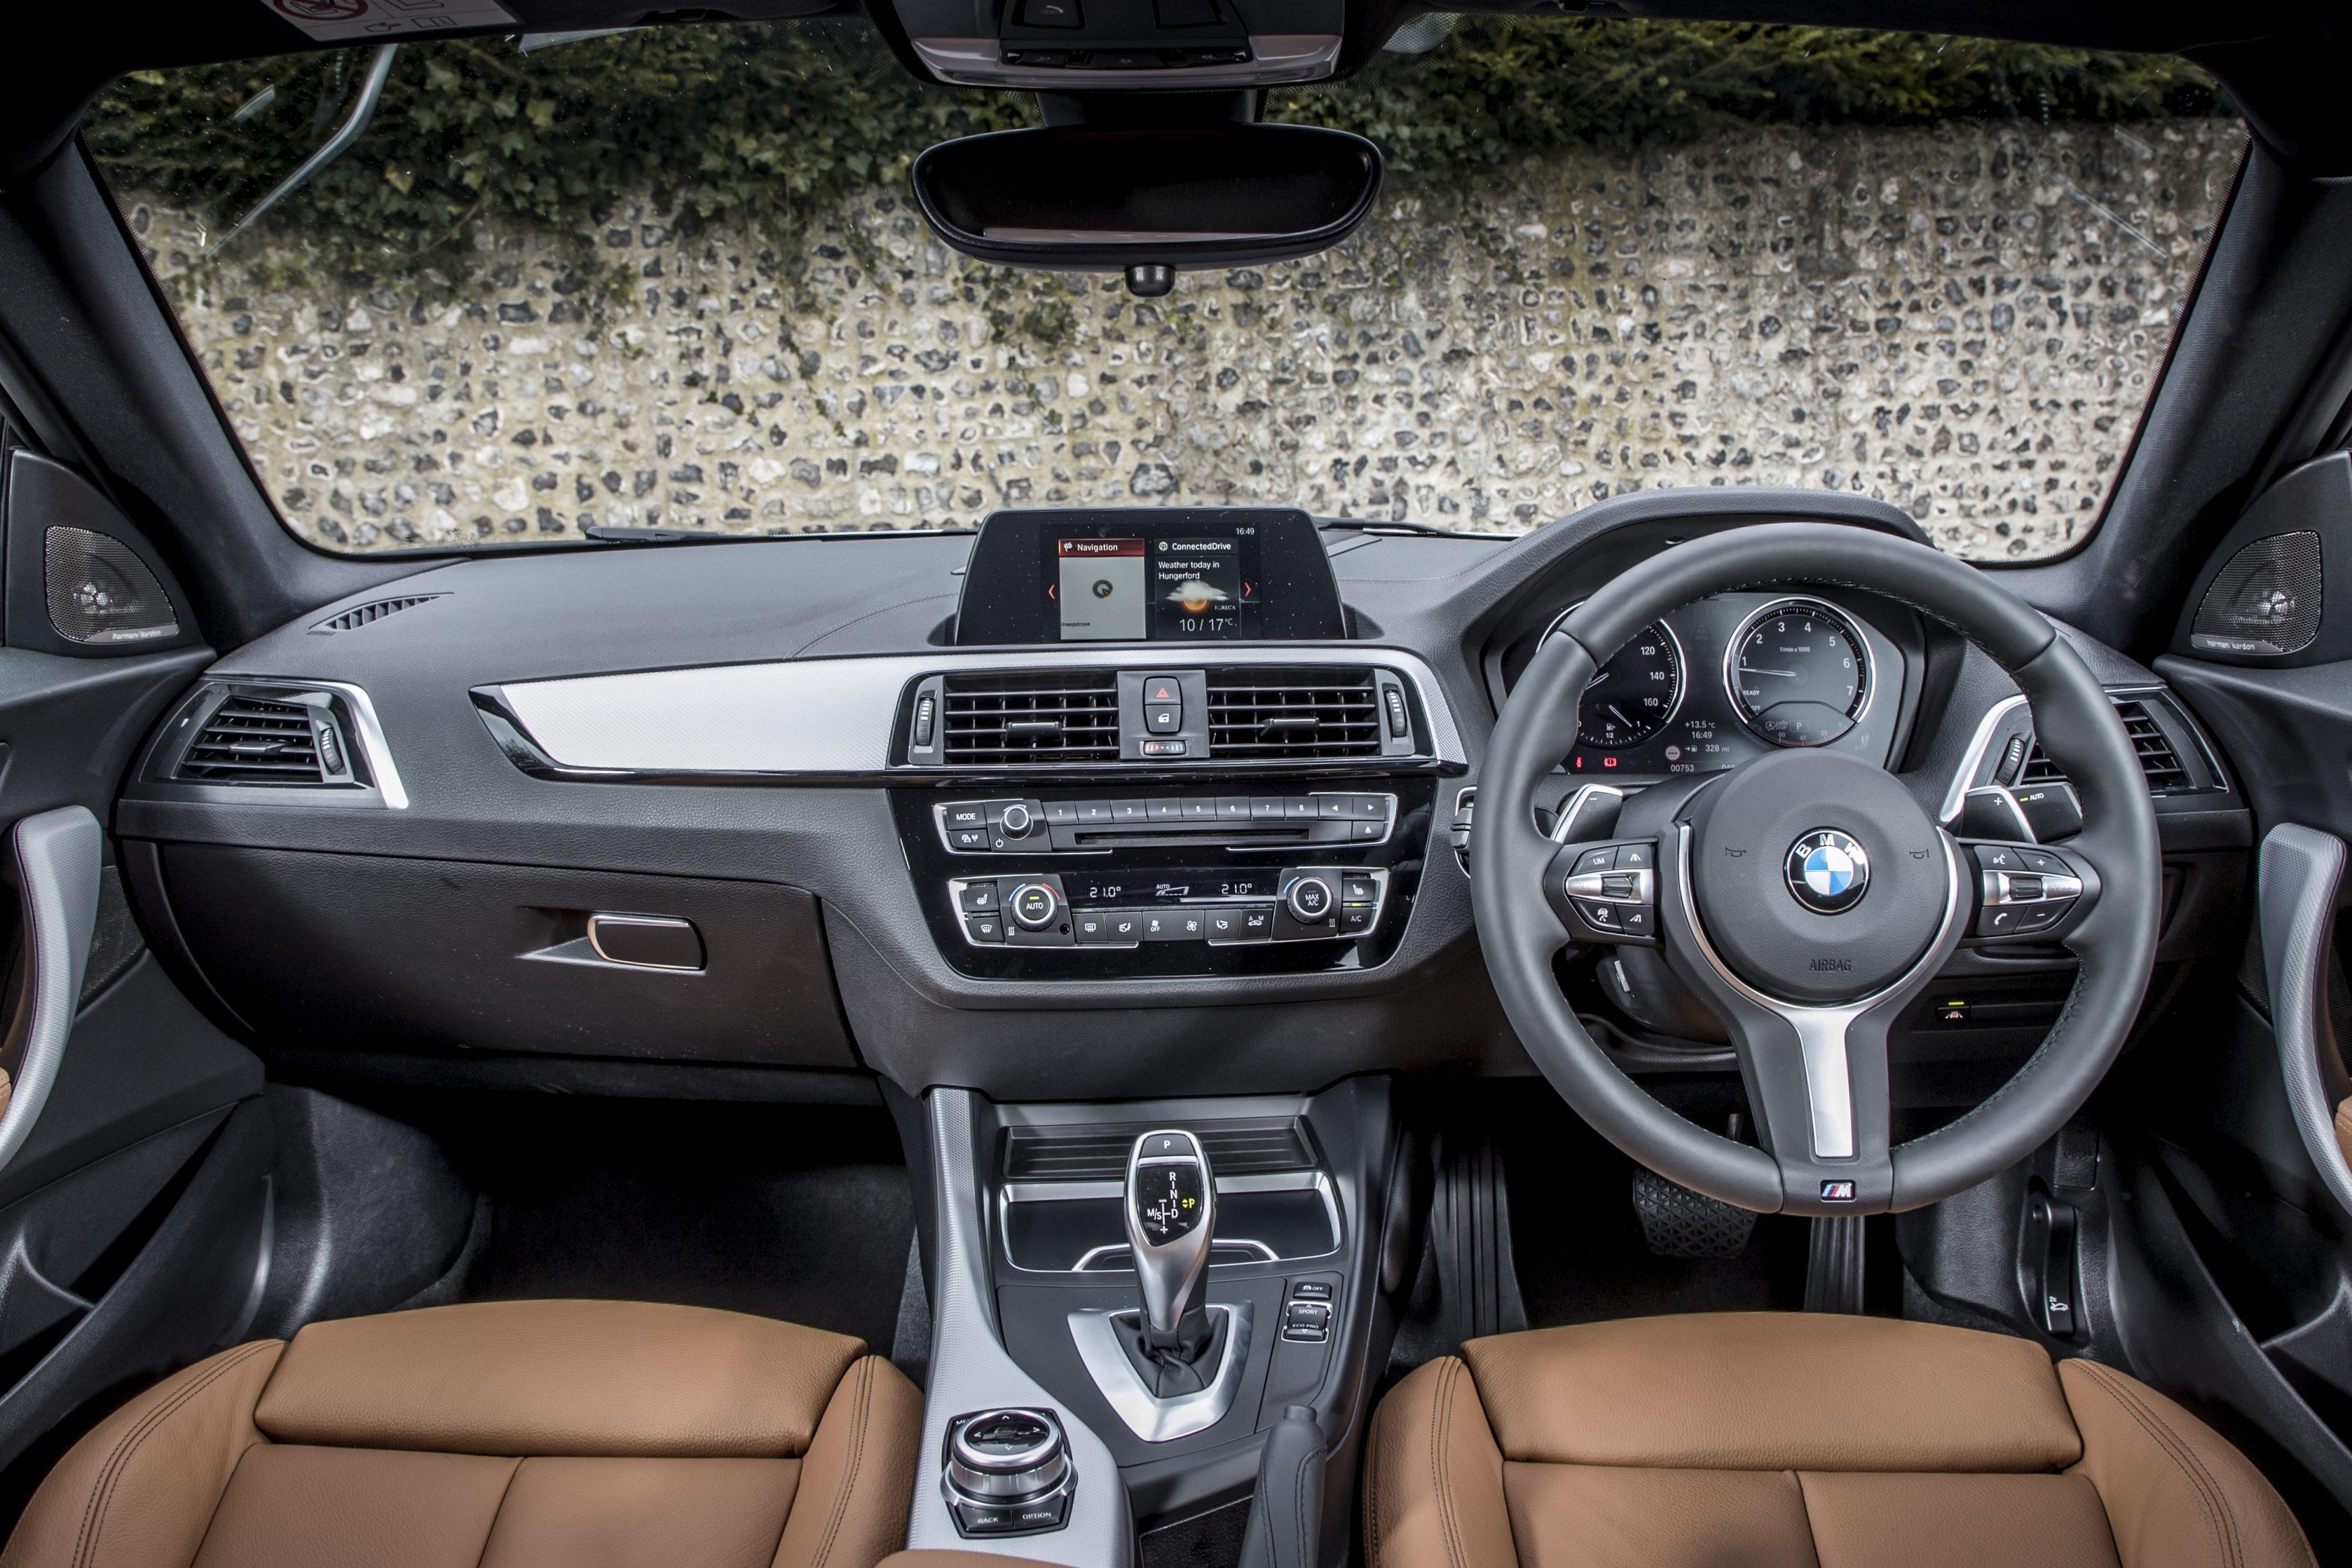 BMW 2 Series interior